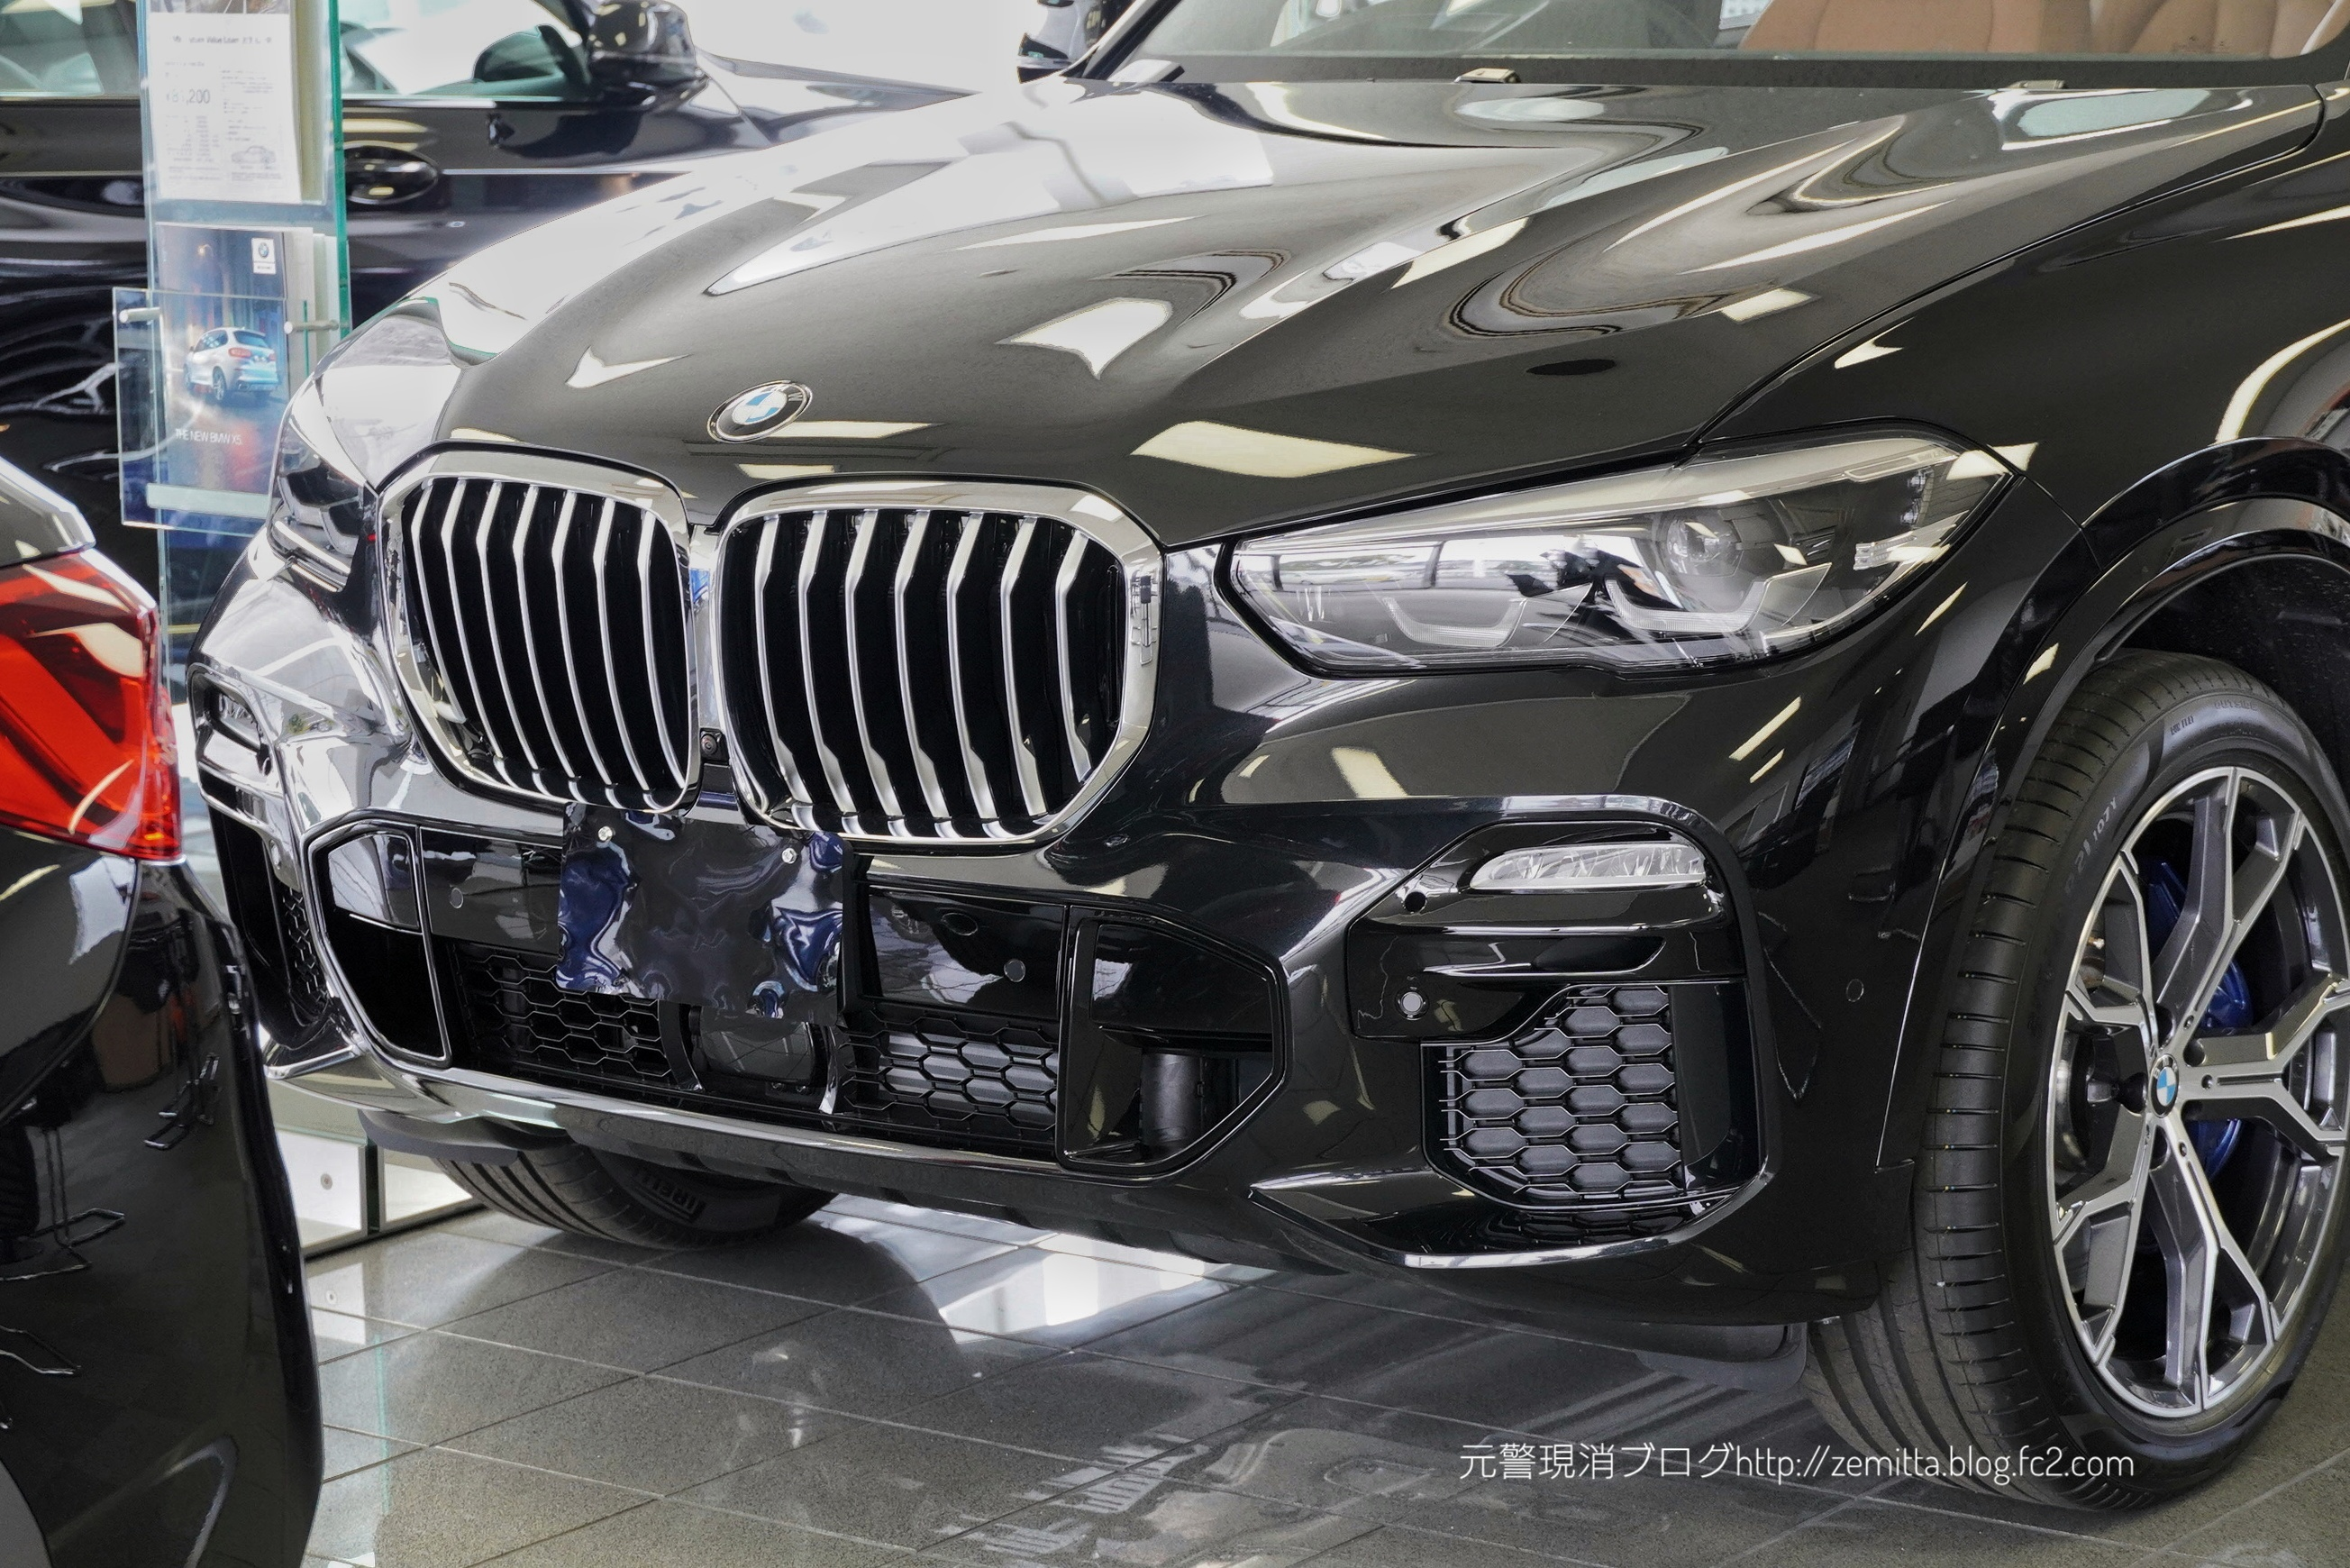 BMWX5ex1.jpeg